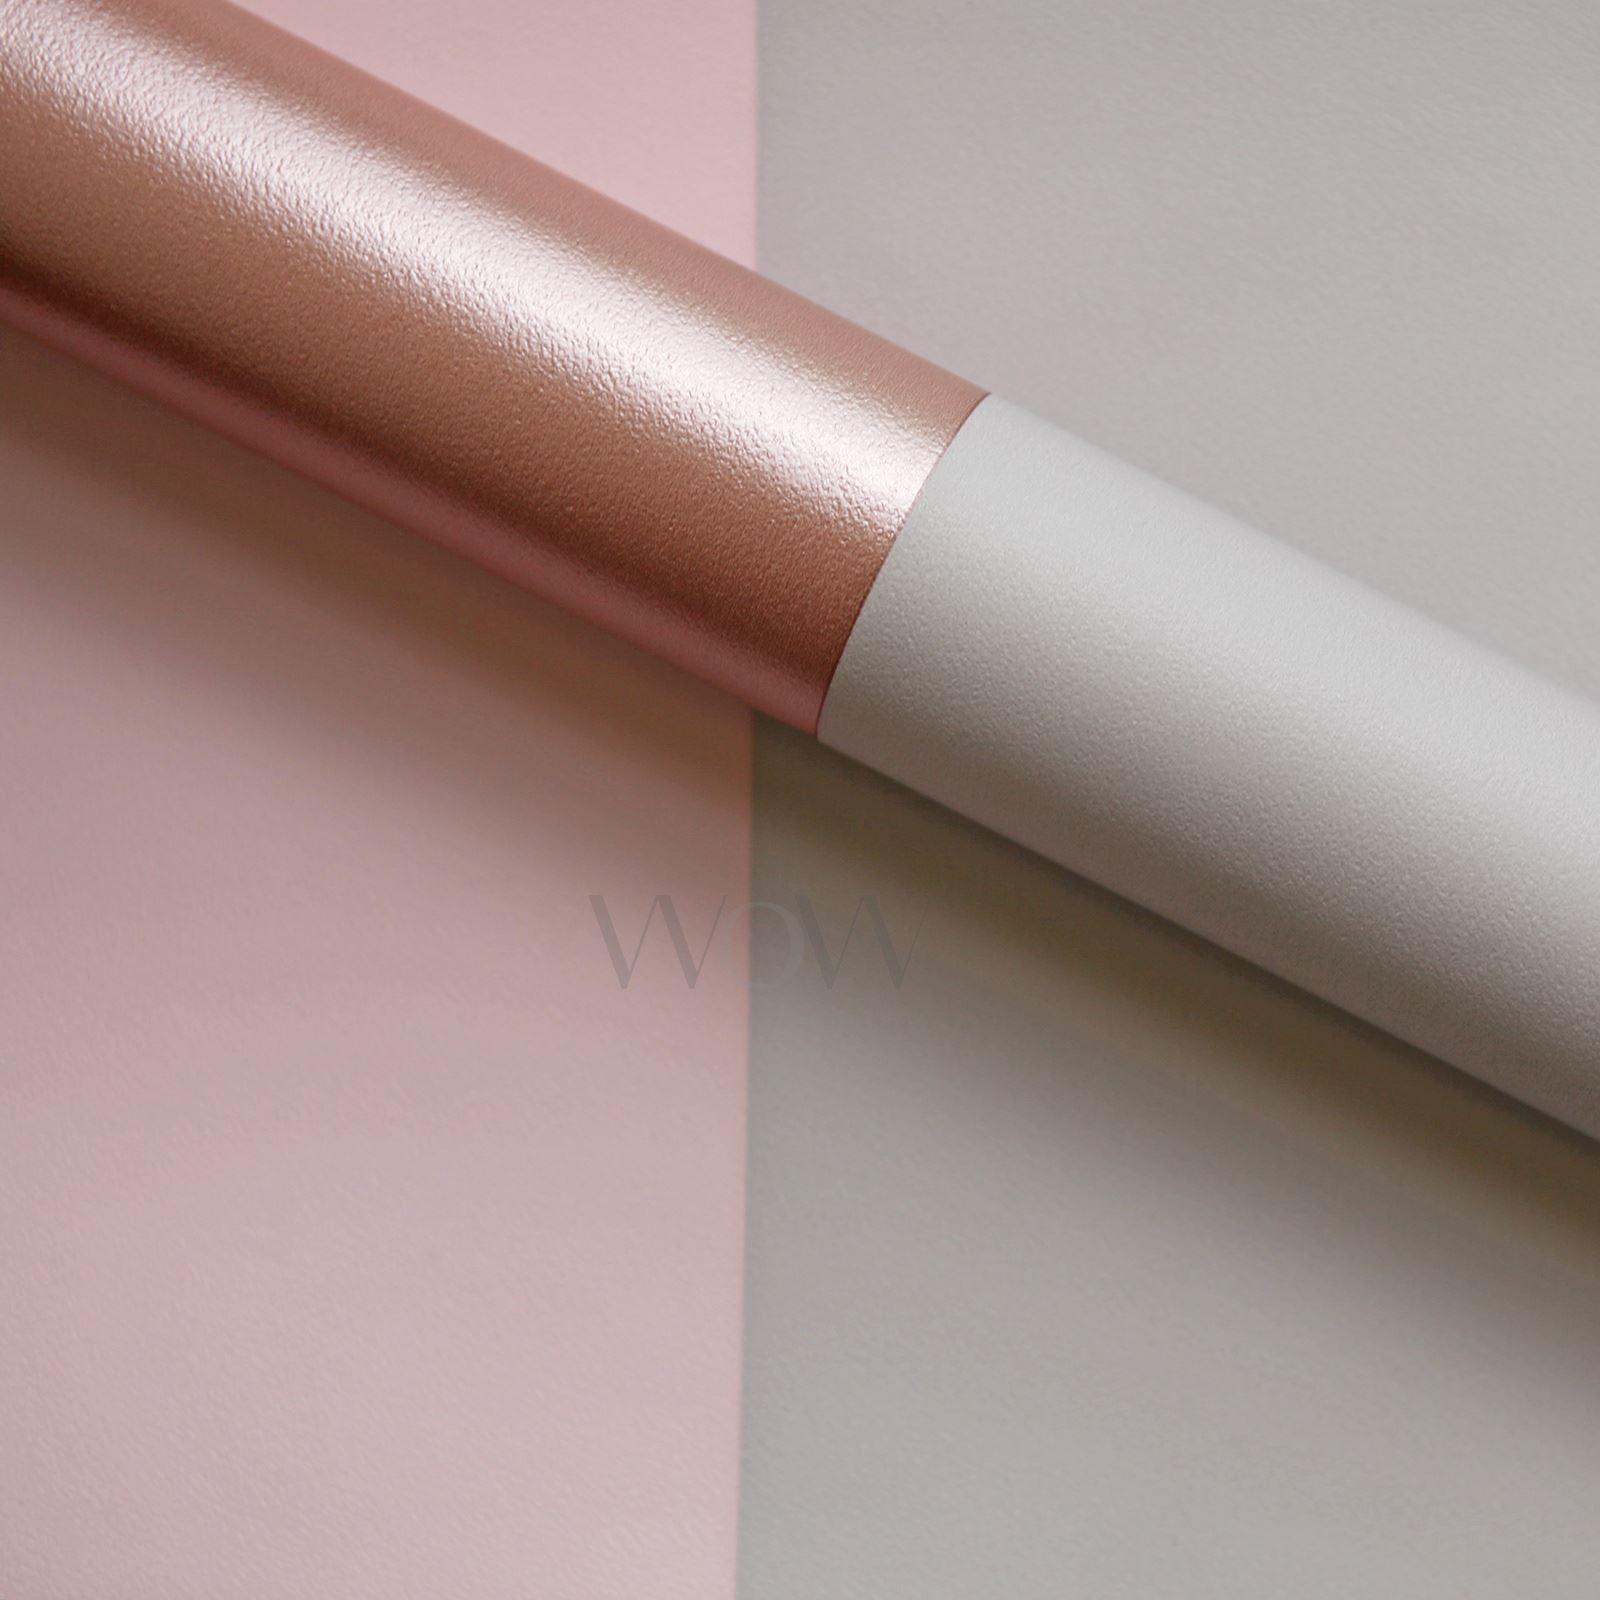 Simple Wallpaper High Quality Rose Gold - 70584cac-88f0-4d7b-a515-40aada3db715  Graphic_74169.jpg